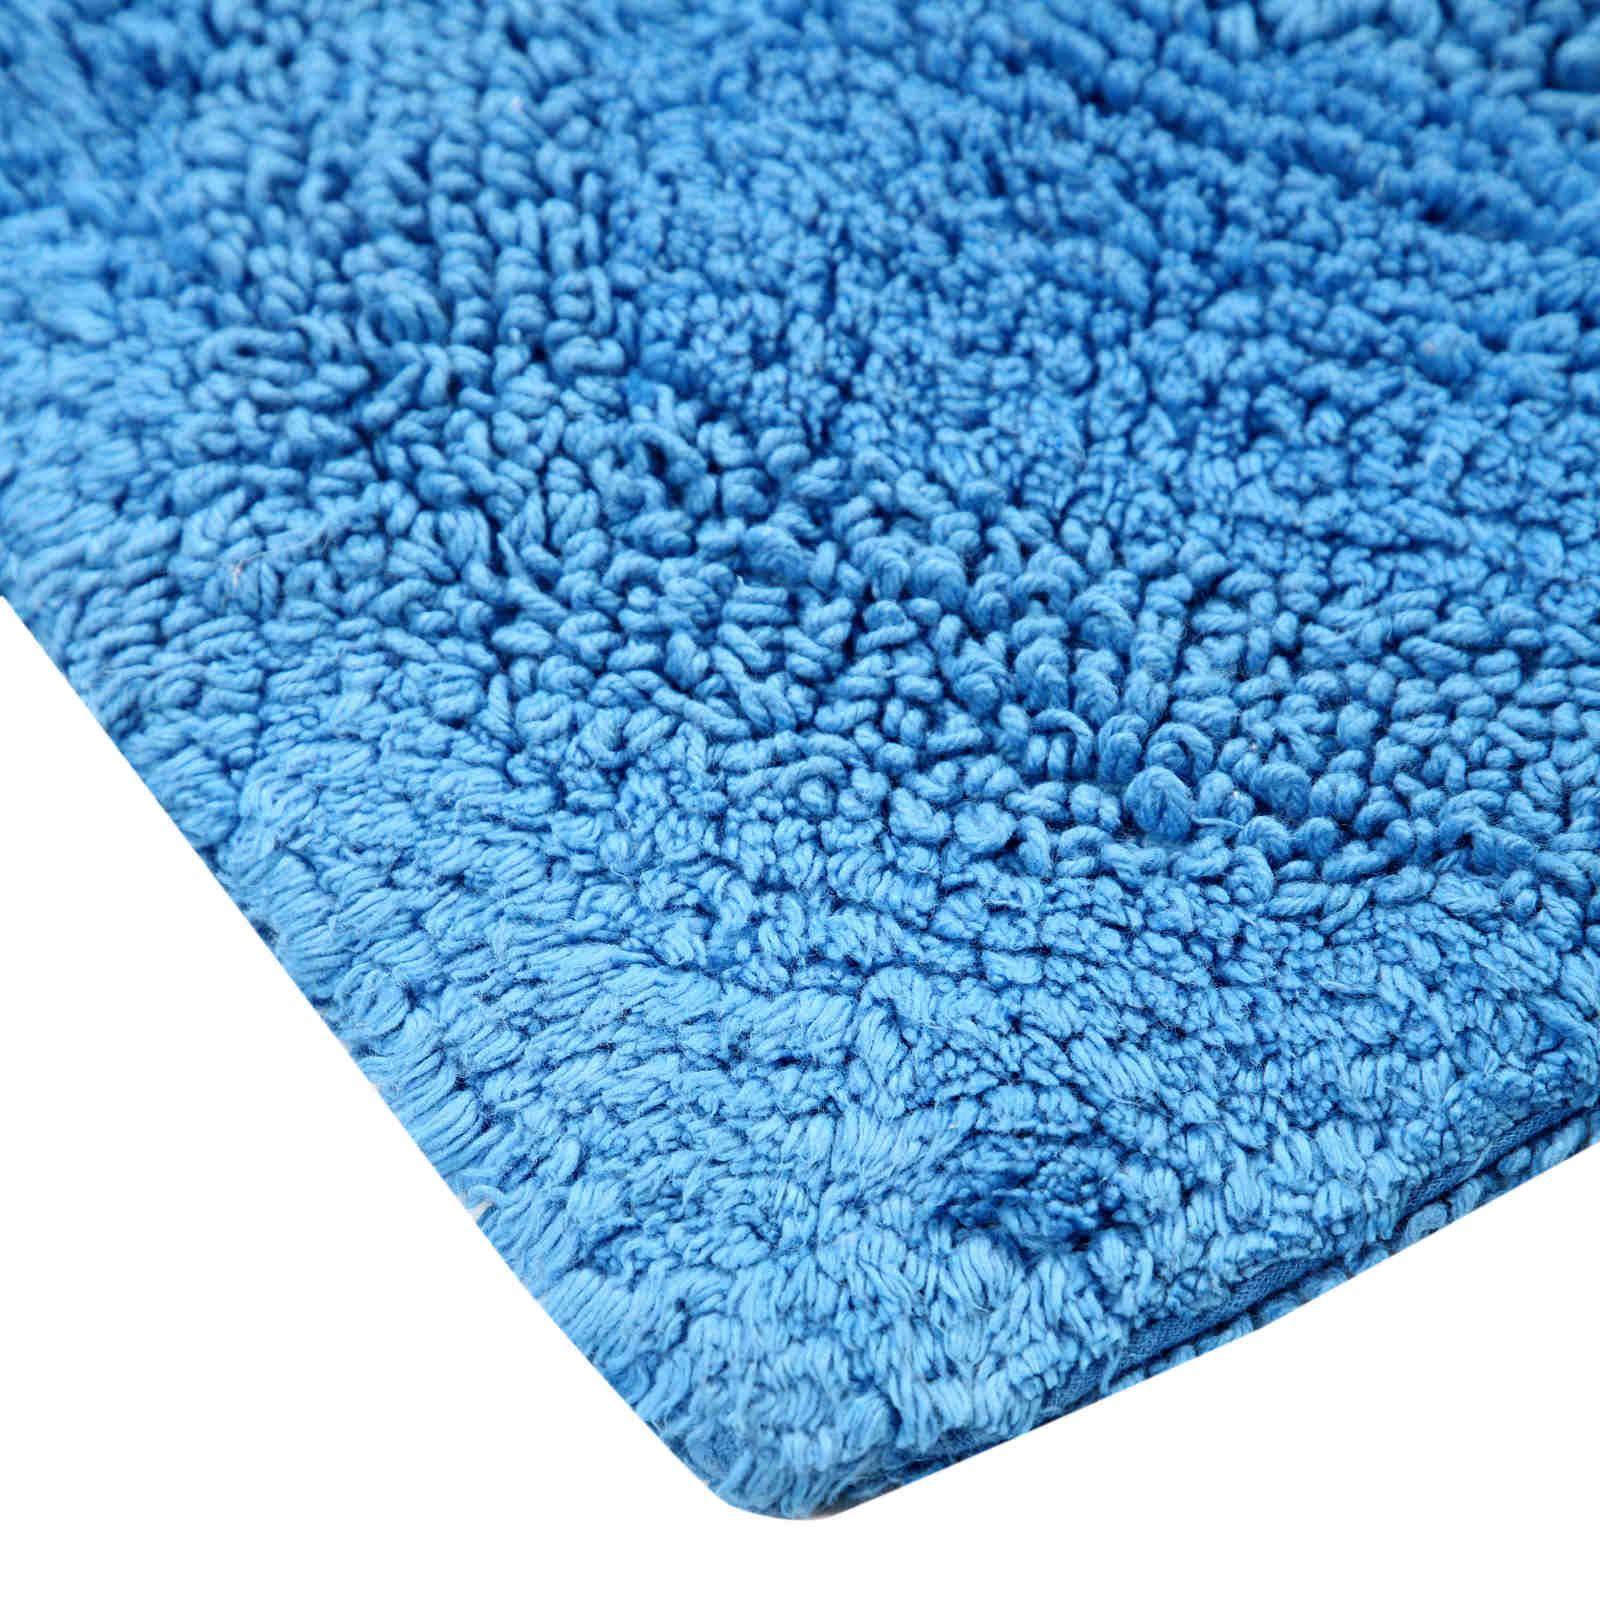 chevron 100 cotton modern bath mat luxury shower mats absorbent bathroom rug ebay. Black Bedroom Furniture Sets. Home Design Ideas